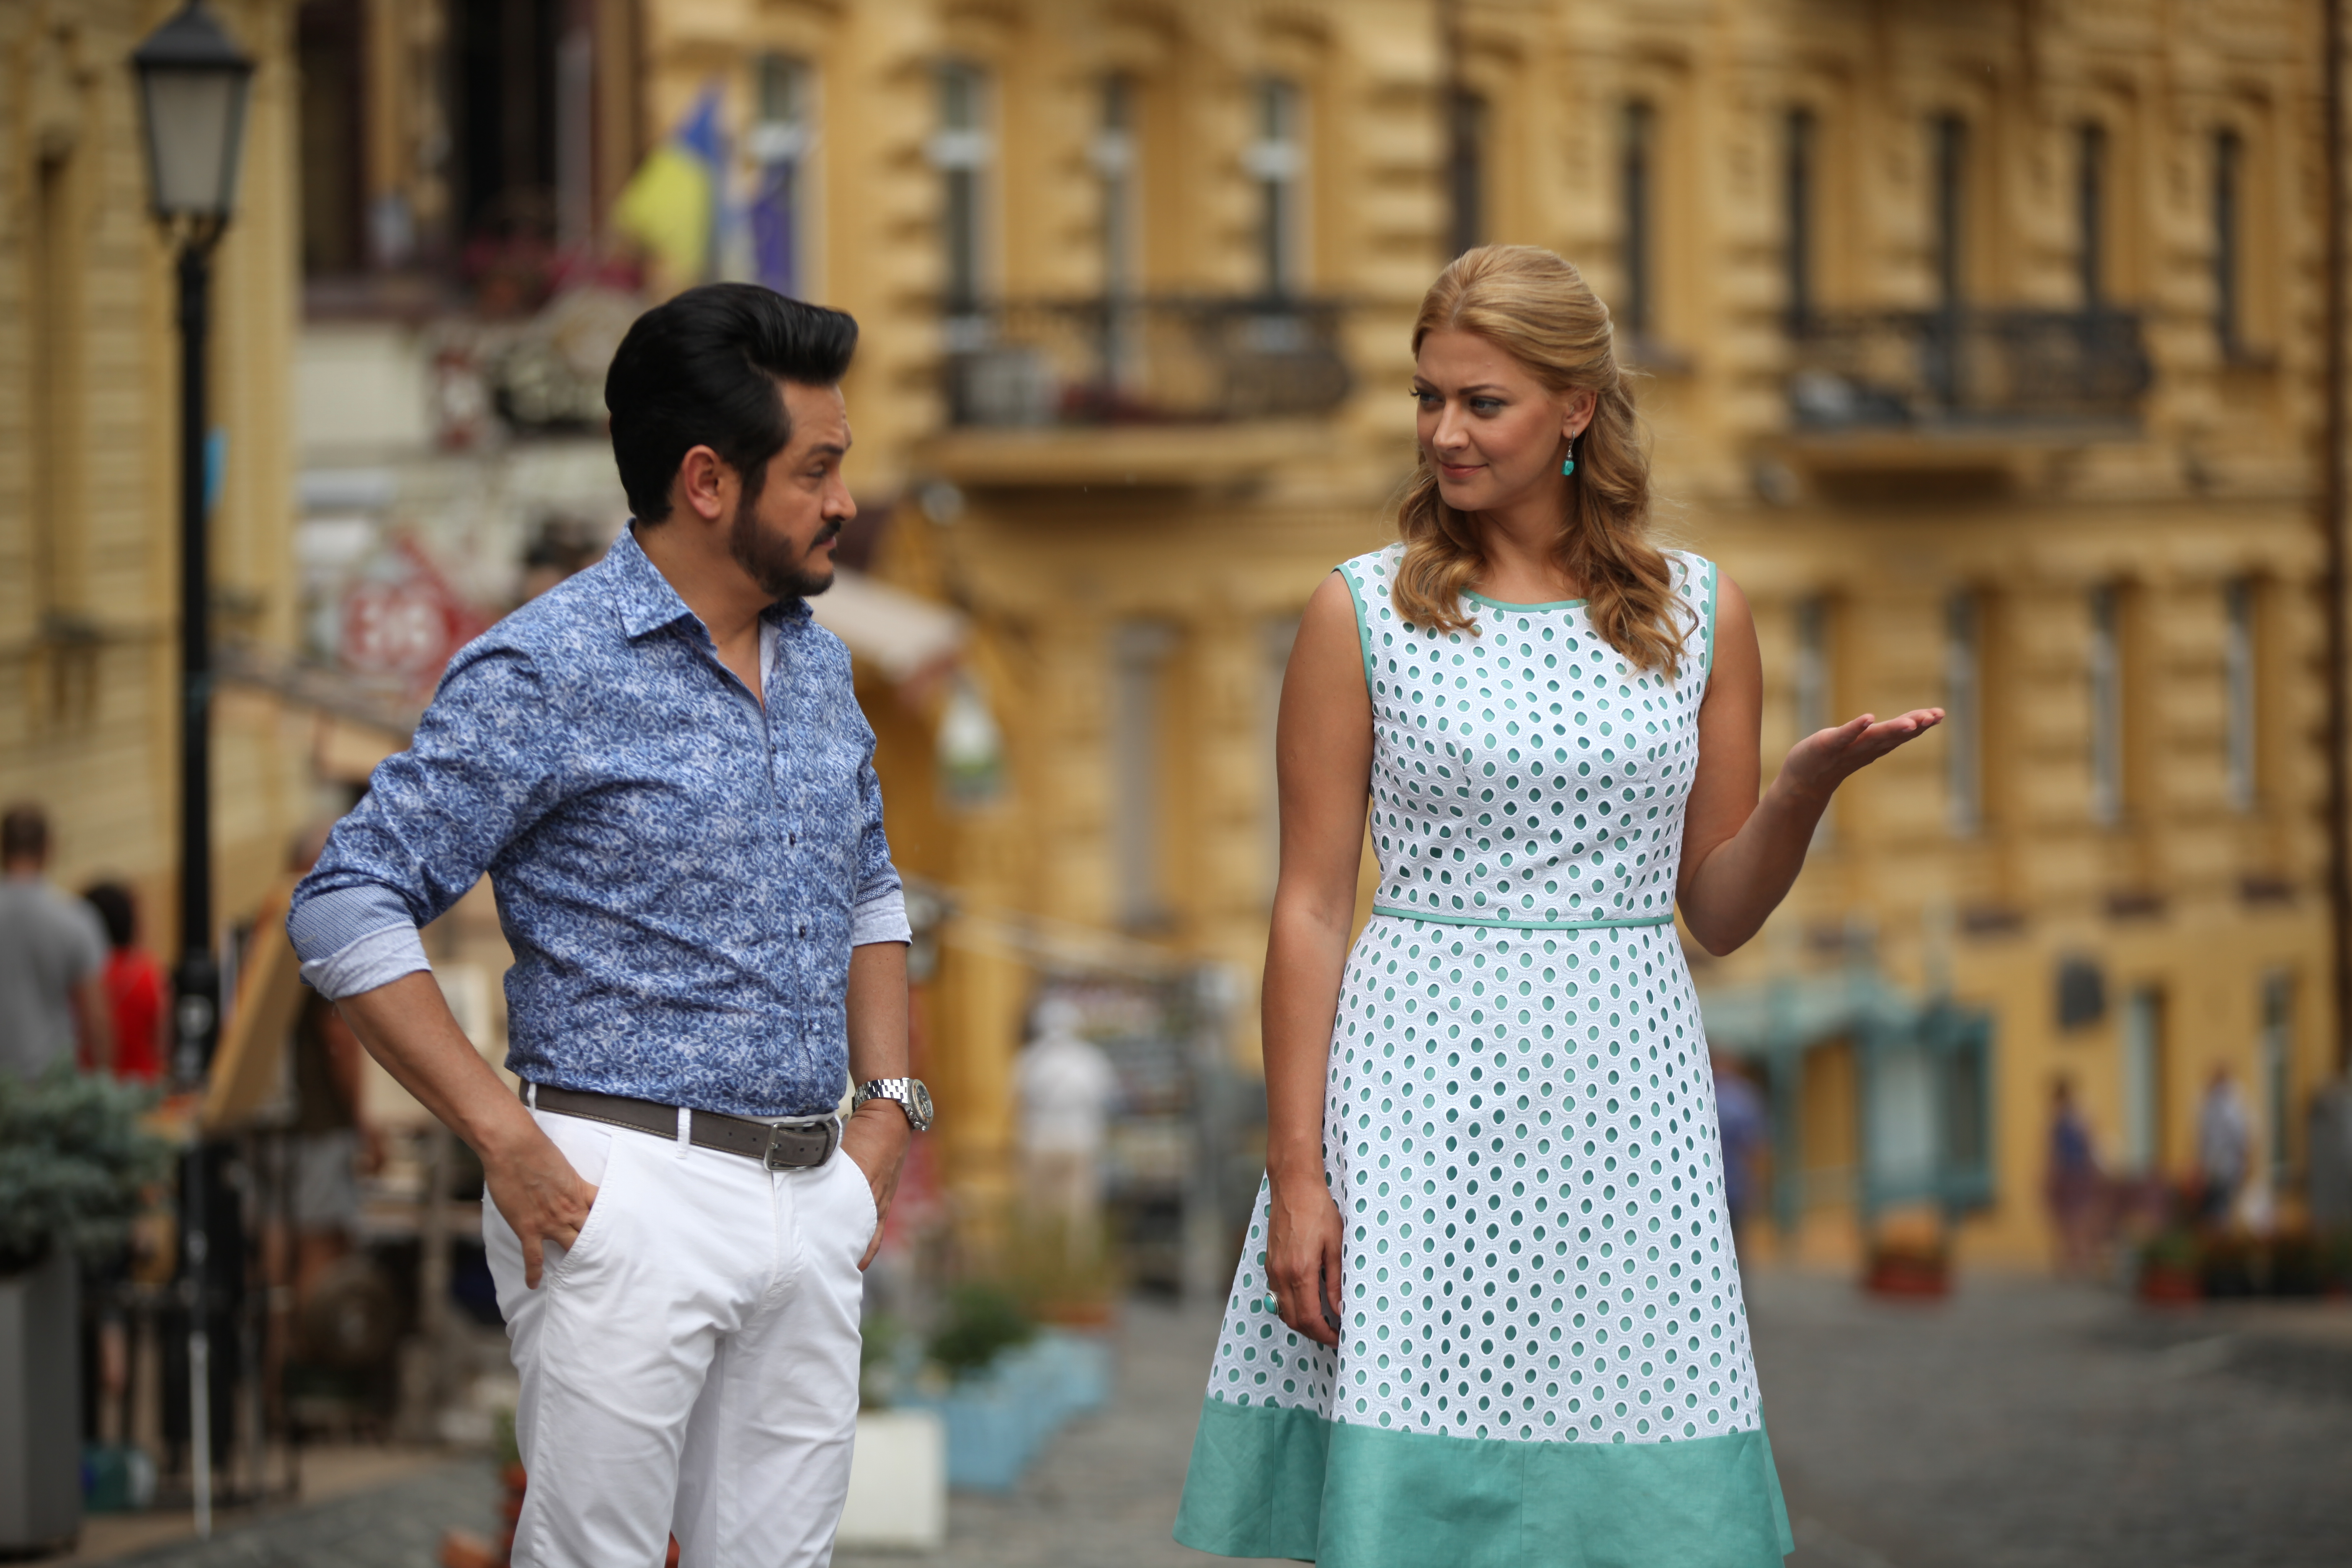 МастерШеф 5: Судьи Татьяна Литвинова и Эктор Хименес- Браво